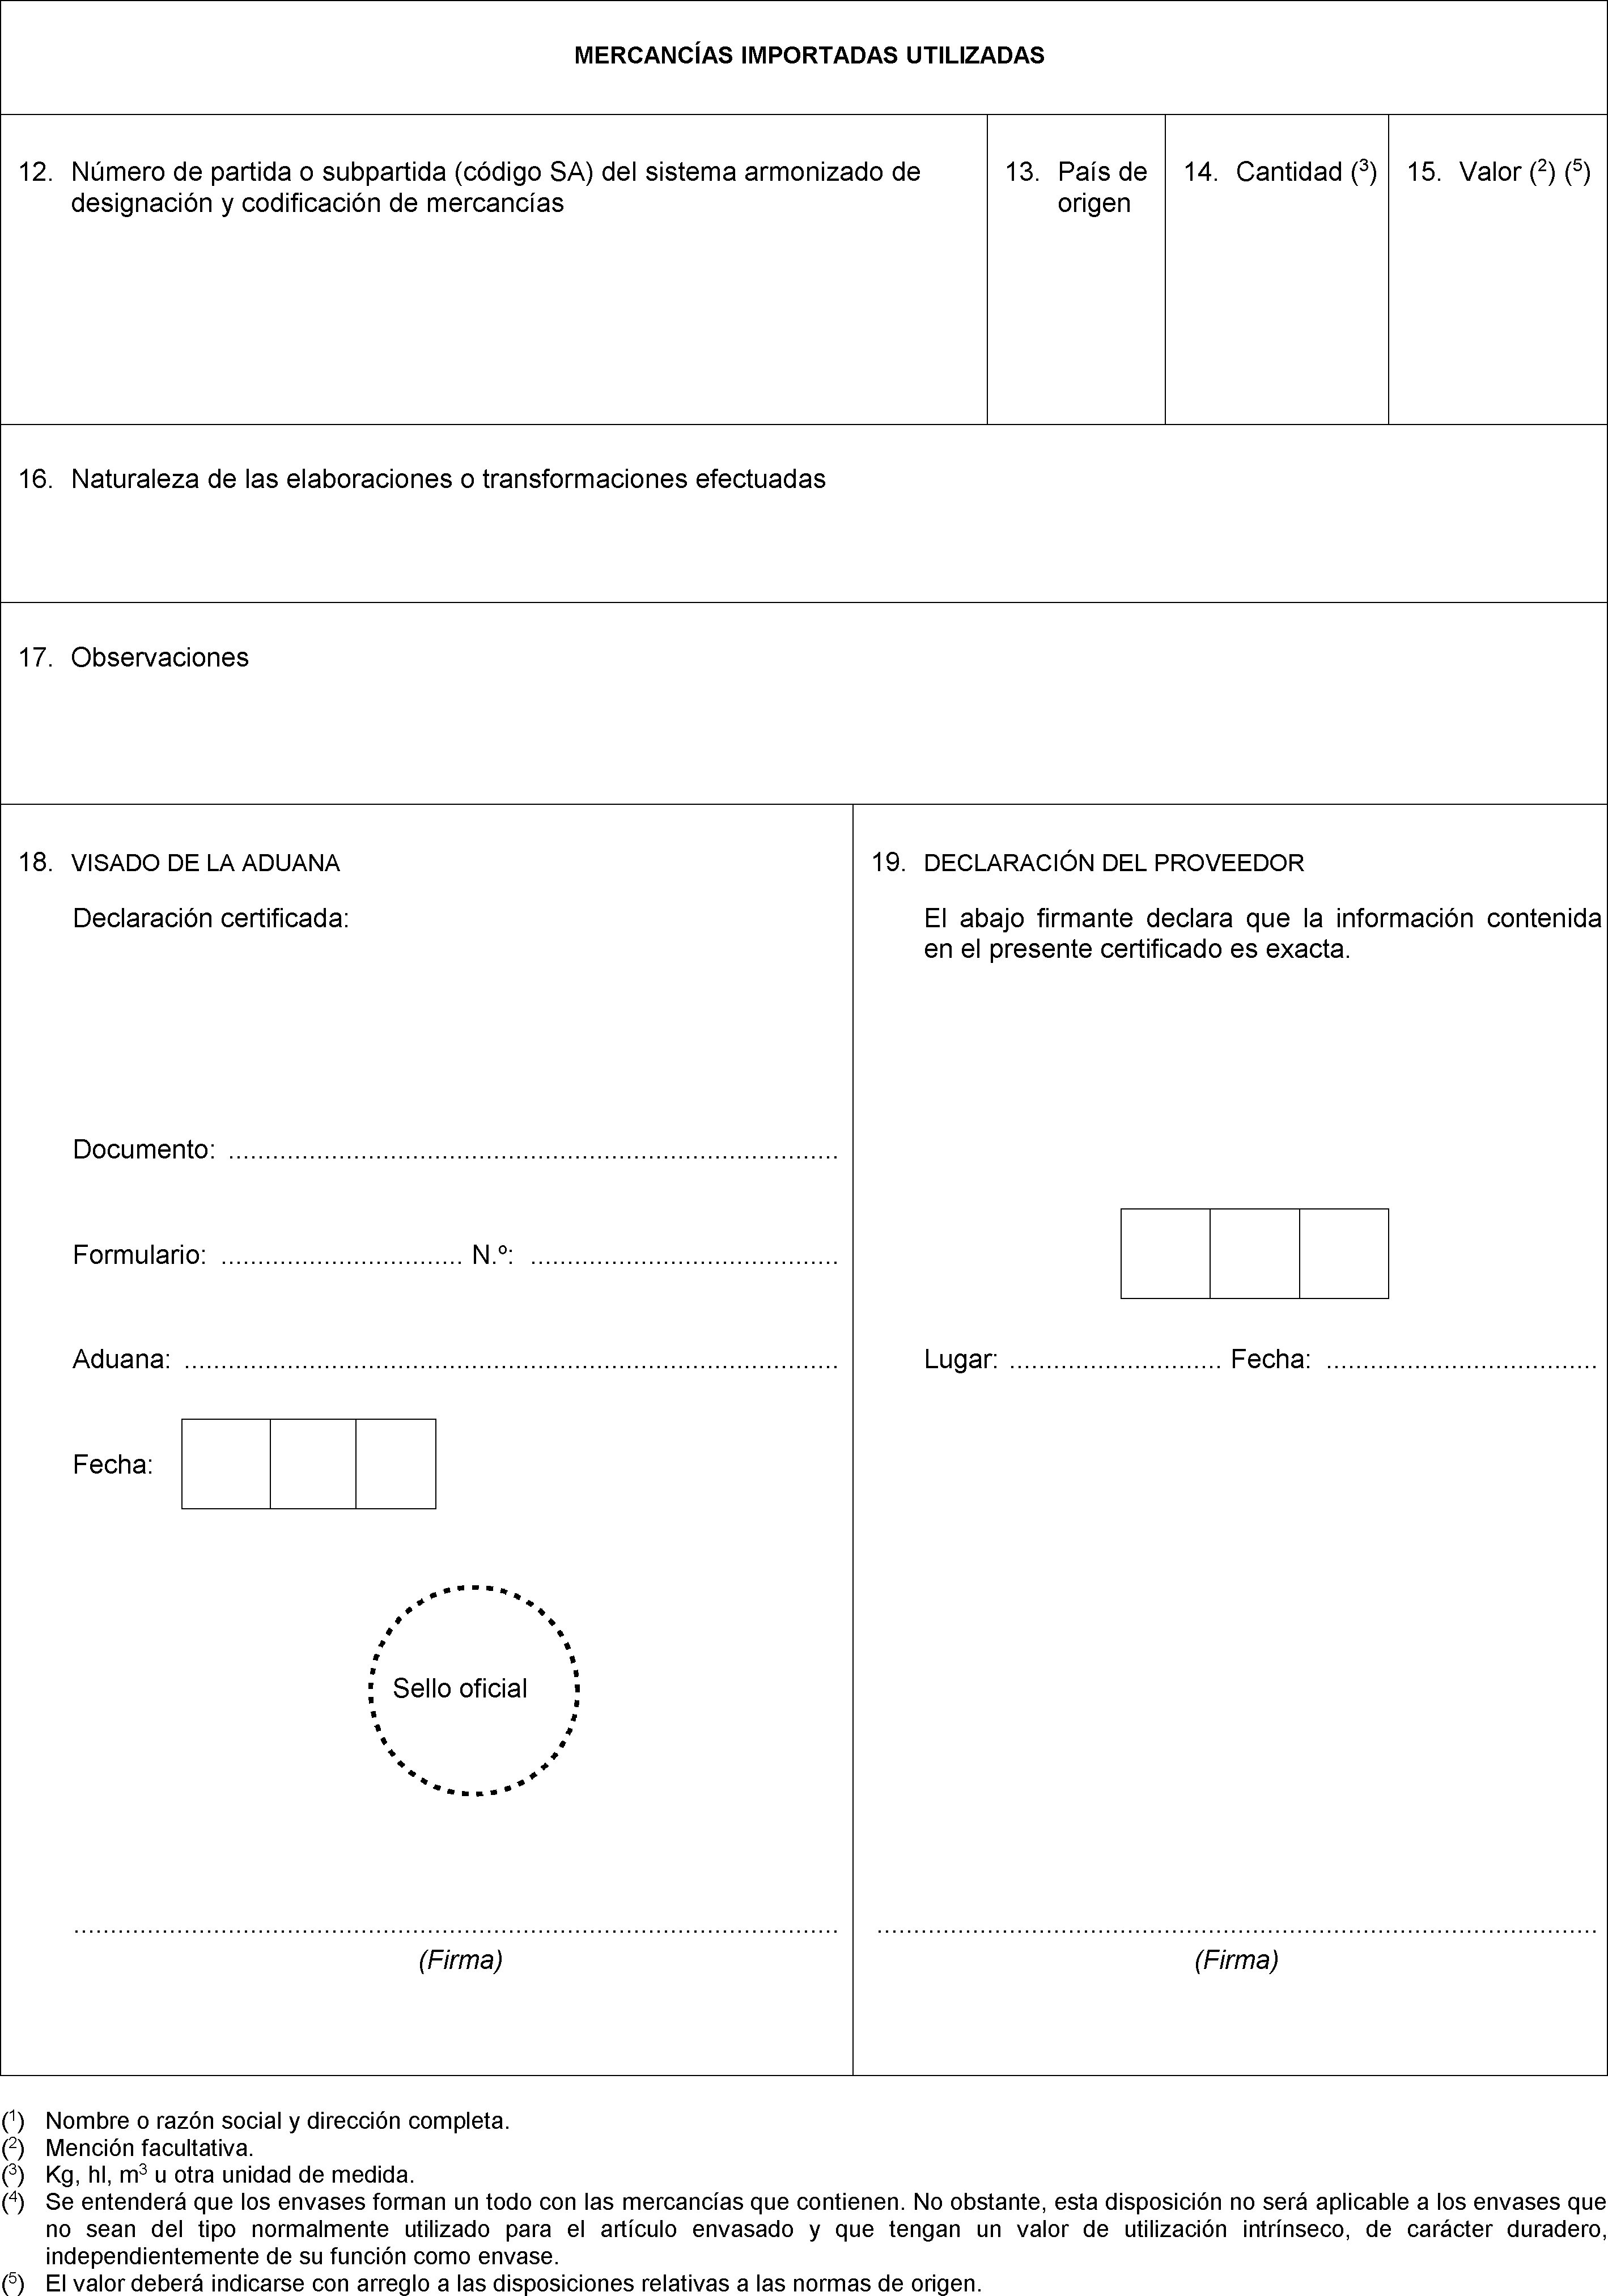 EUR-Lex - 02016R1076-20170916 - EN - EUR-Lex